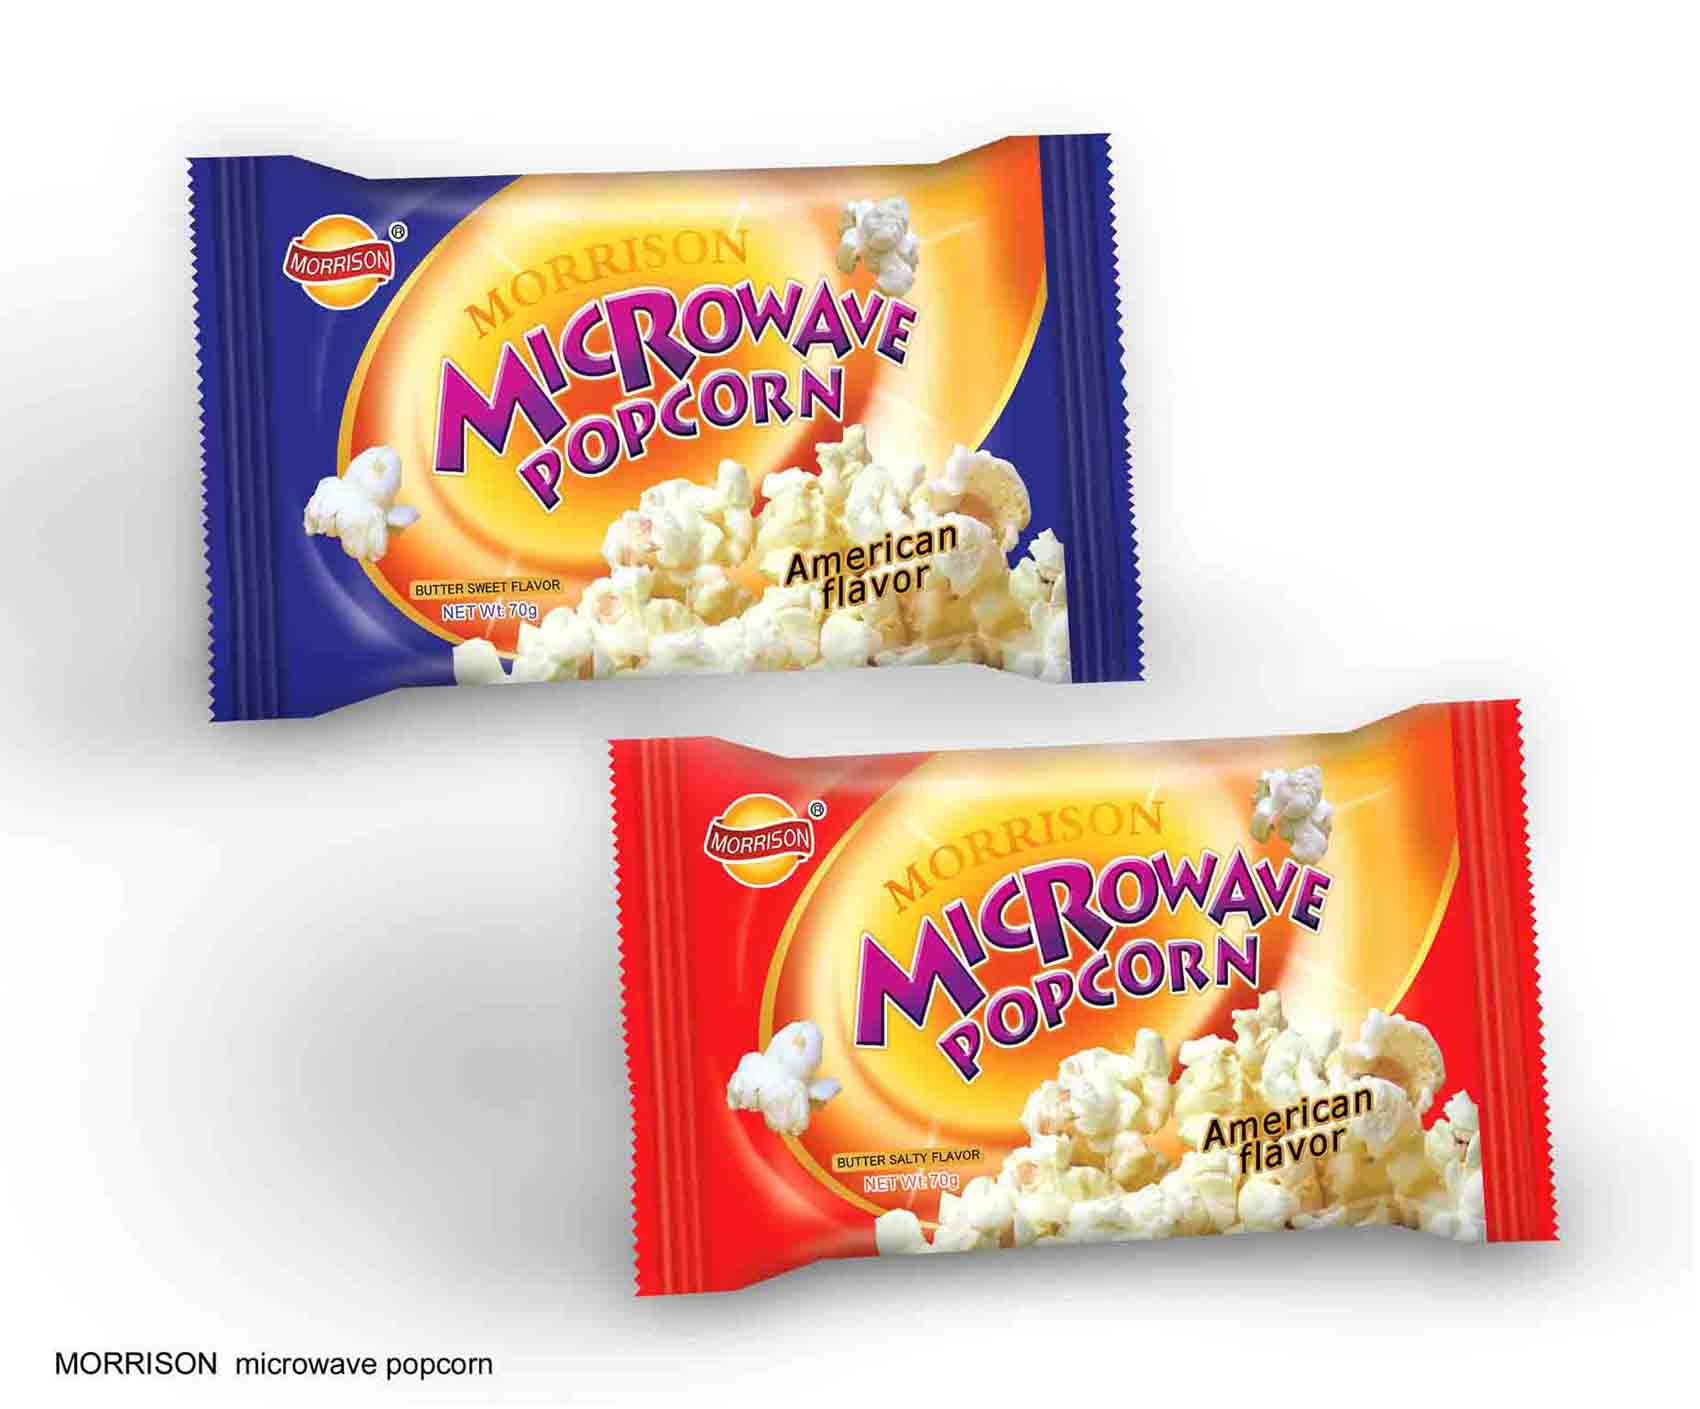 Morrison Microwave Popcorn